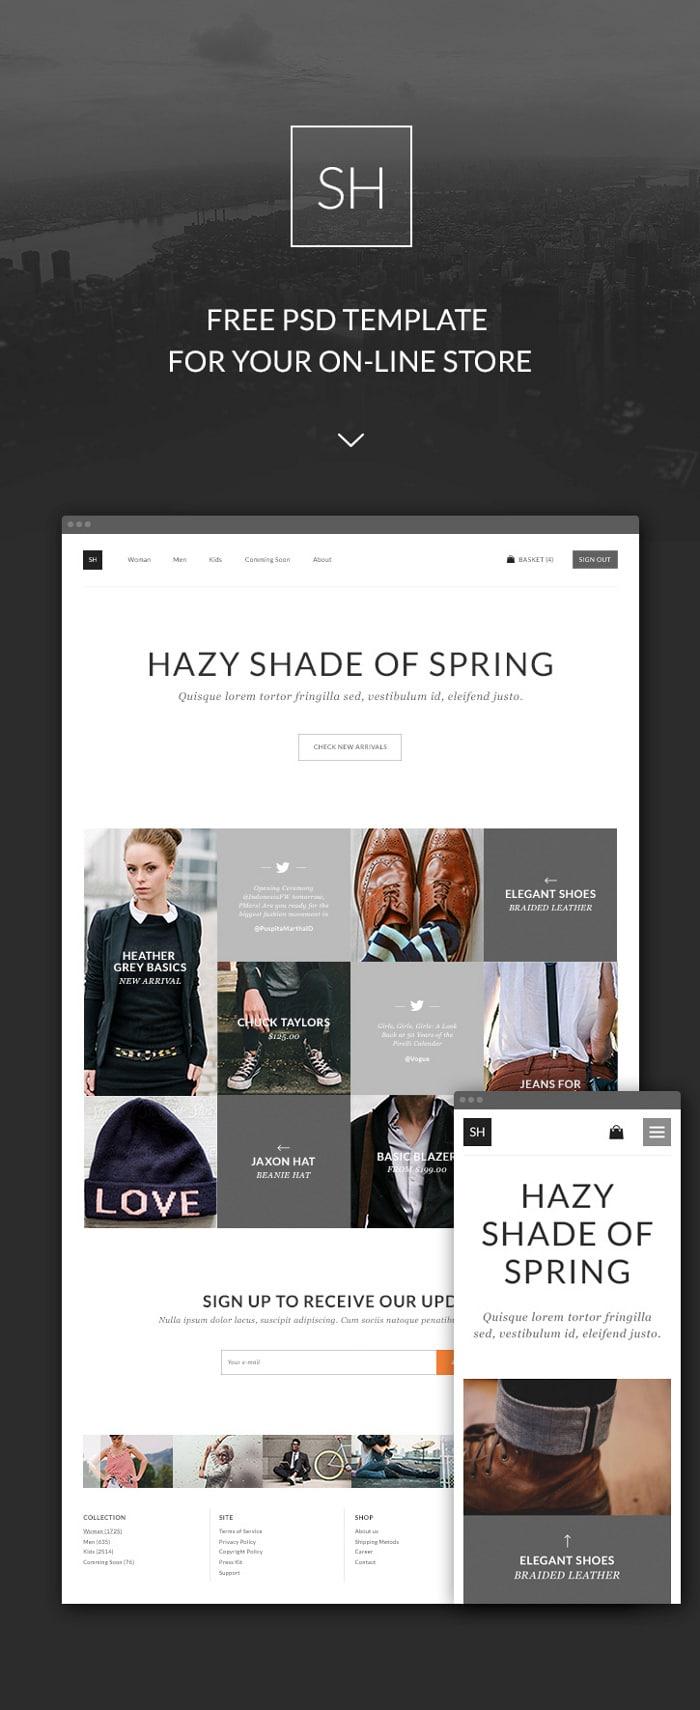 Nice Free Store Template Photos - Professional Resume Example Ideas ...